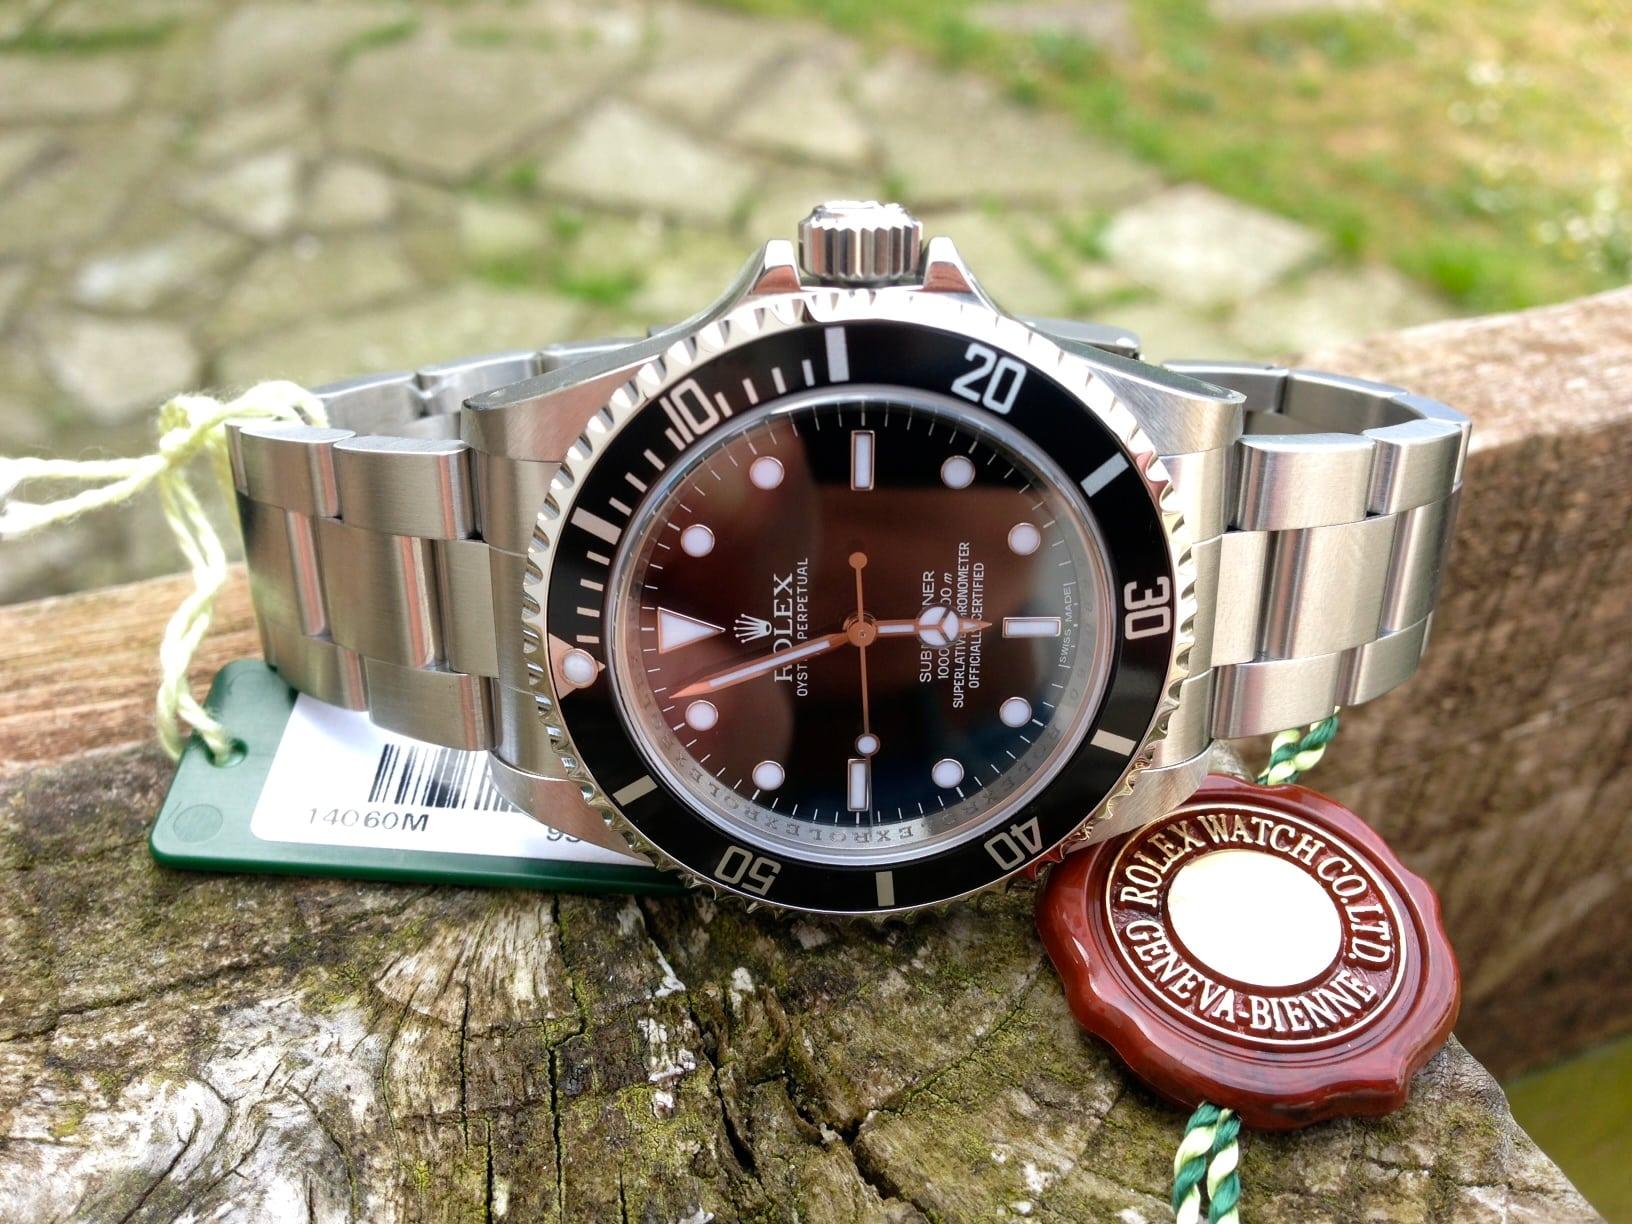 Rolex Submariner steel new-unworn 14060M.